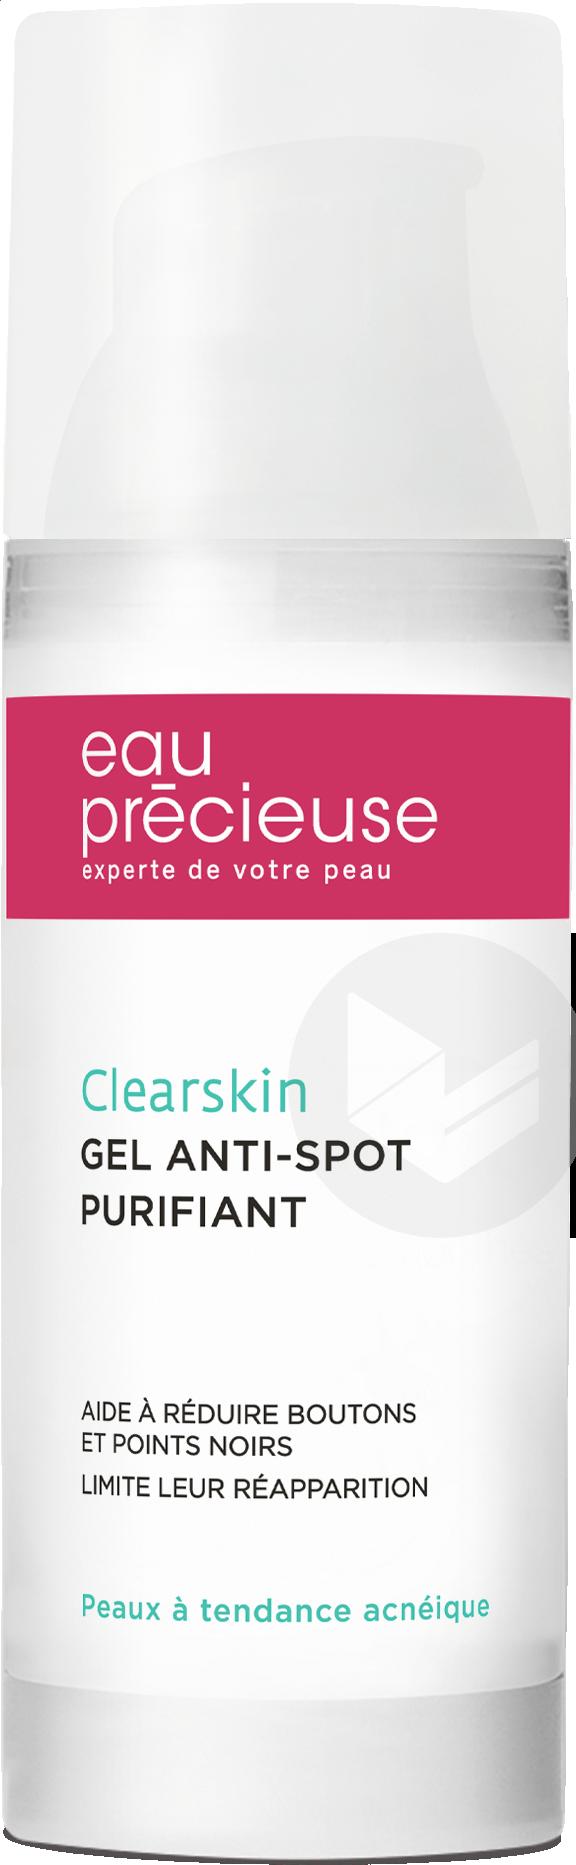 Clearskin Gel Anti Spot Purifiant 50 Ml